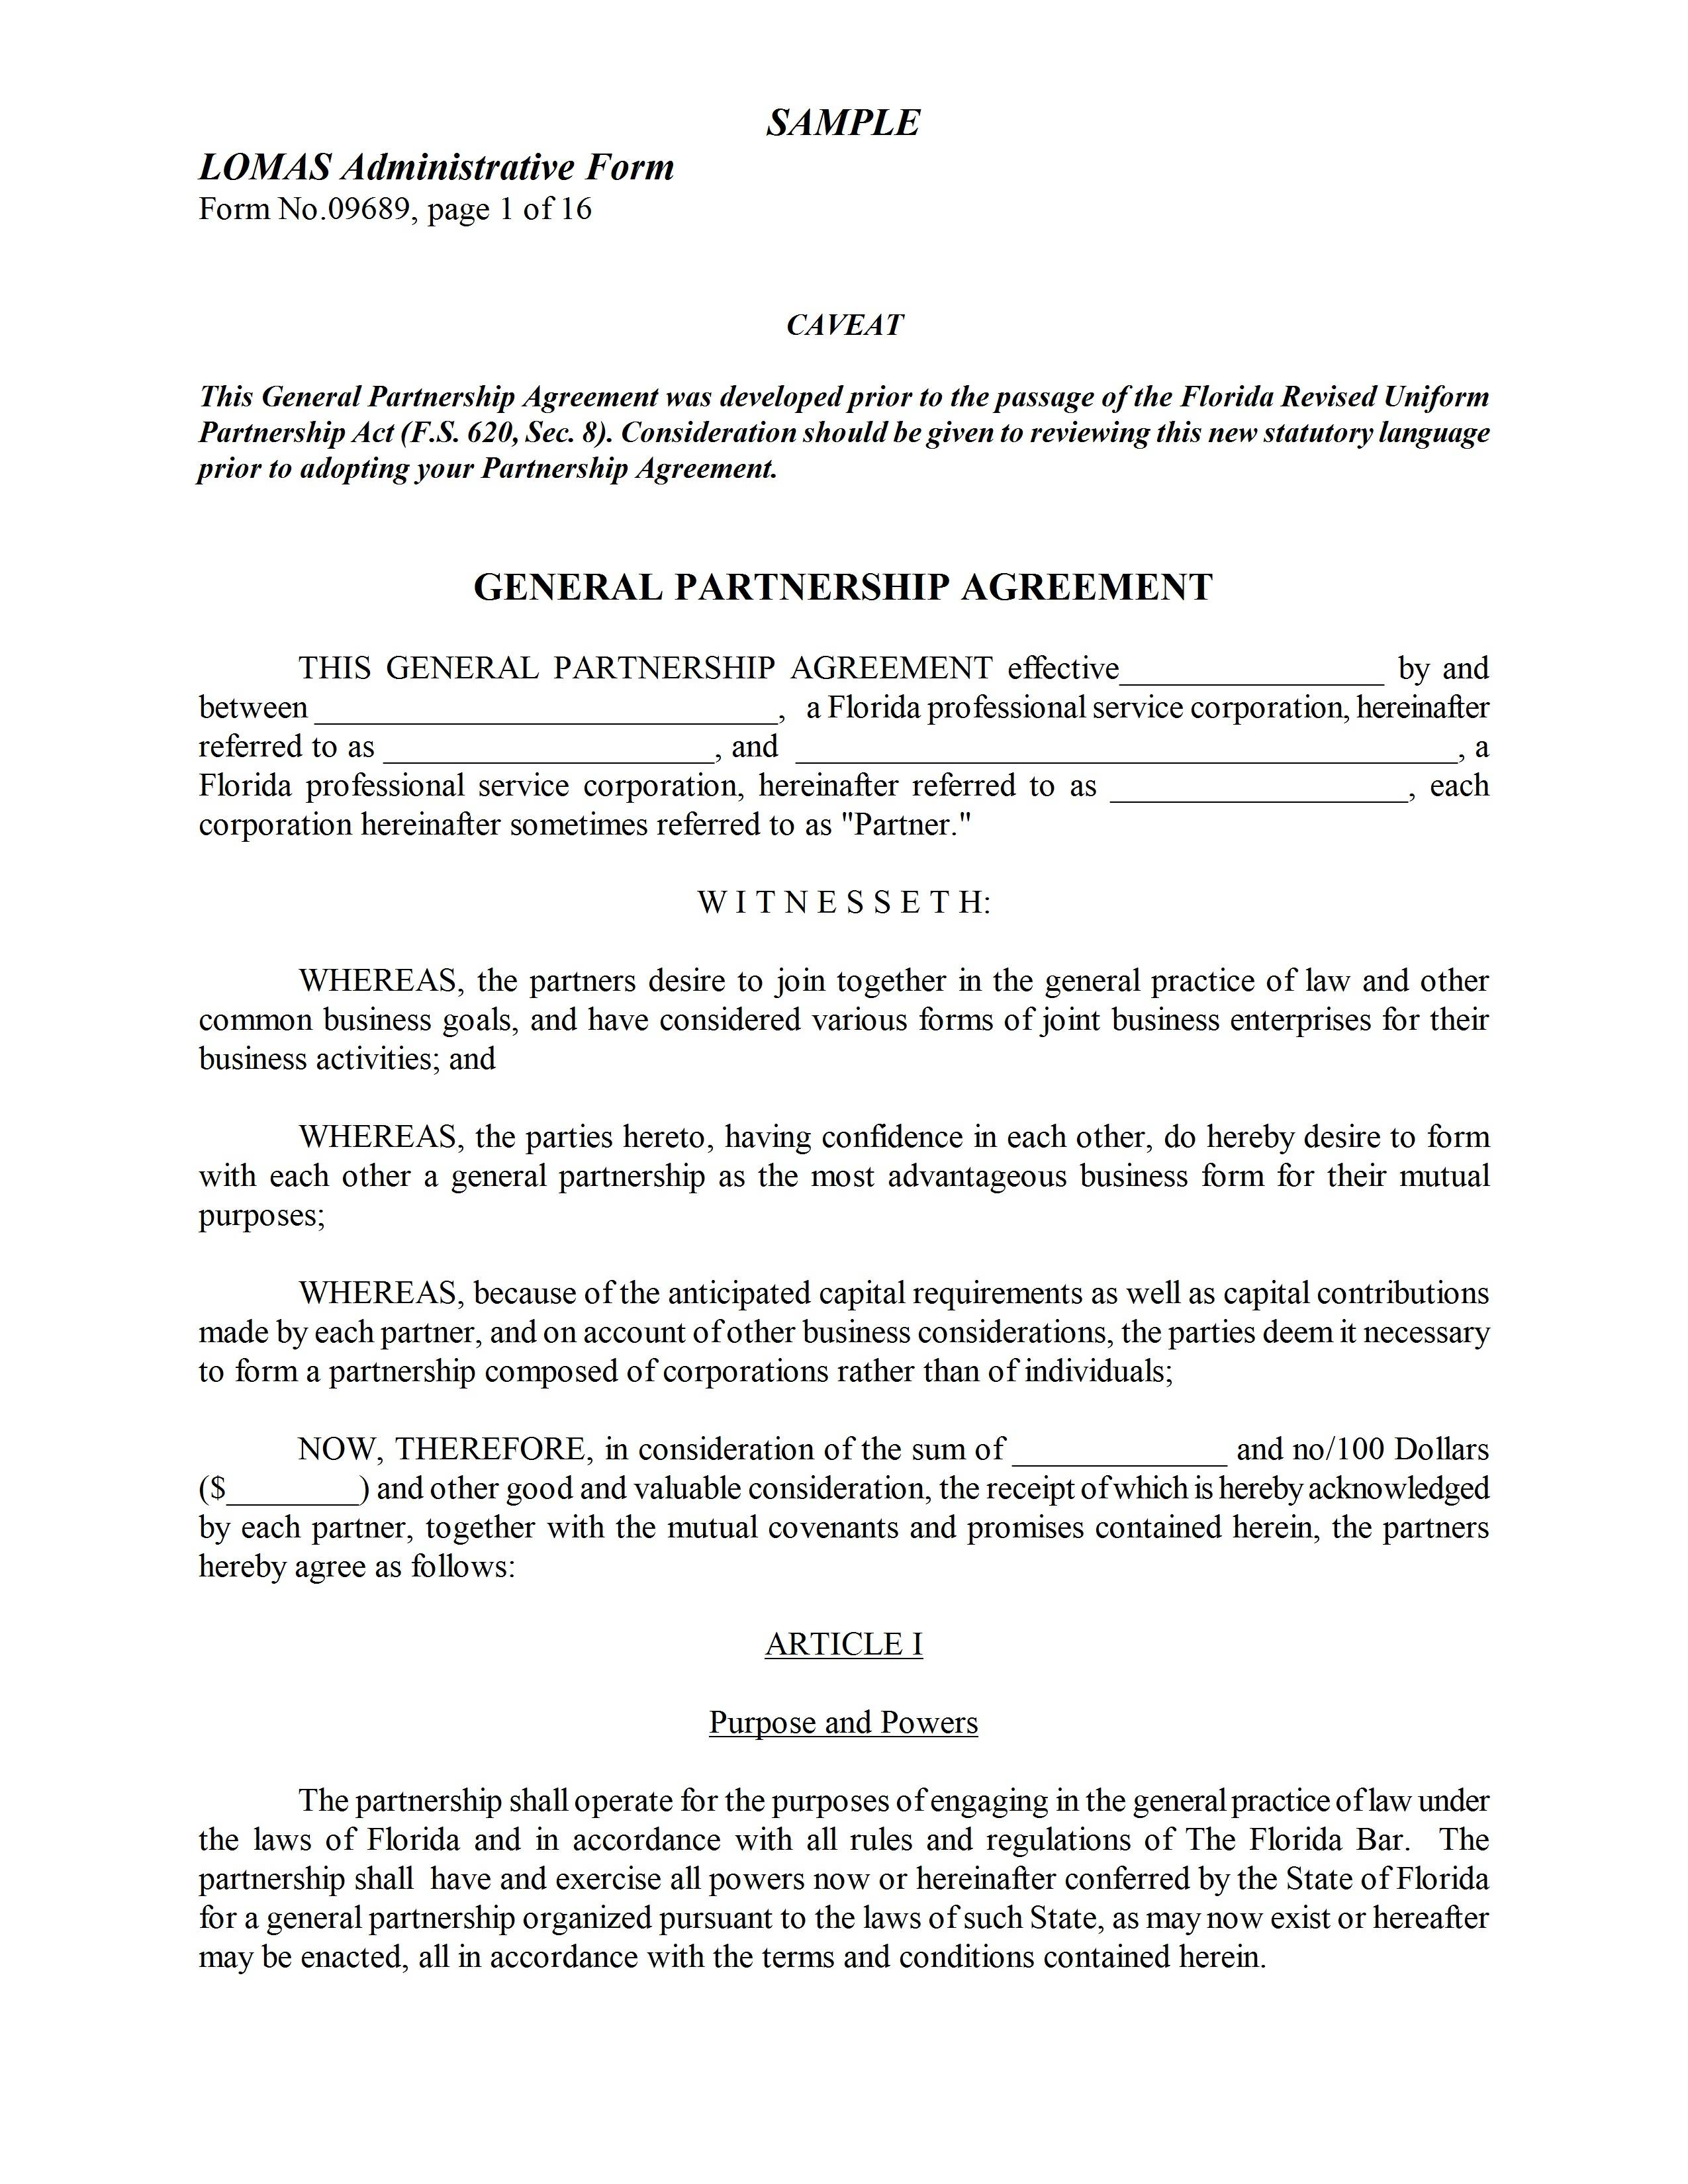 Joint Venture Agreement Template California